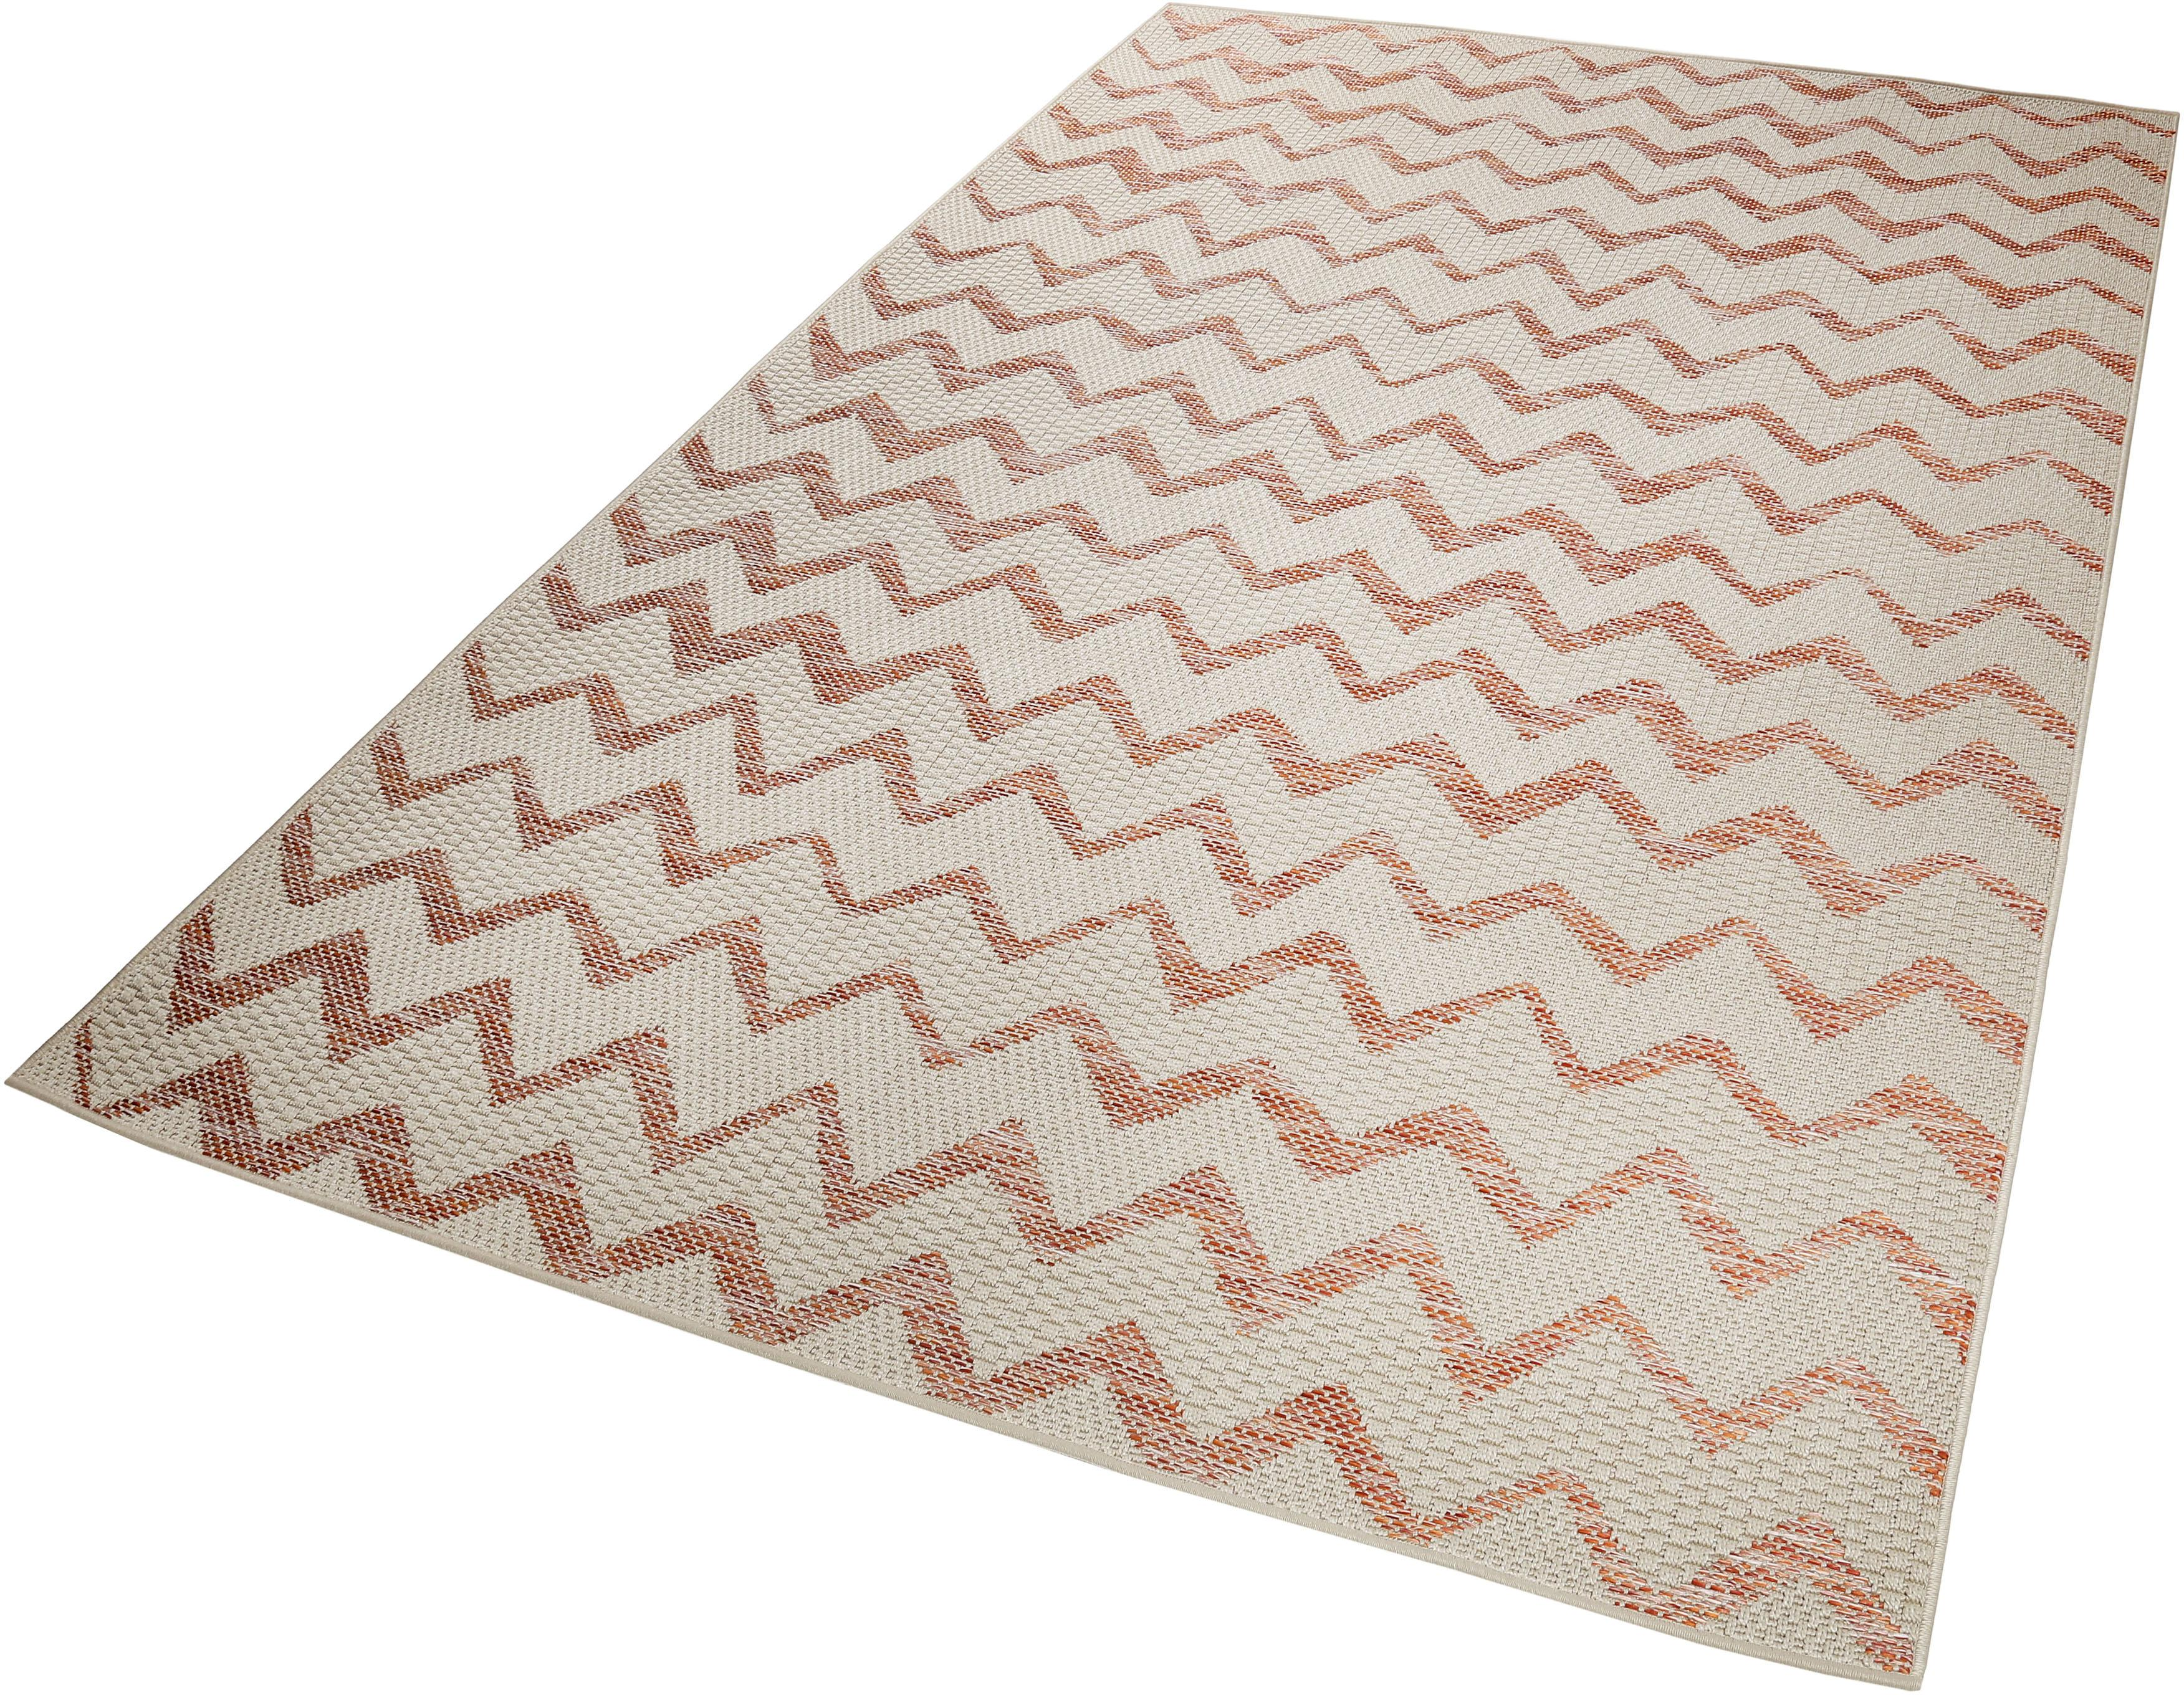 Teppich Zig Zag Esprit rechteckig Höhe 5 mm maschinell gewebt